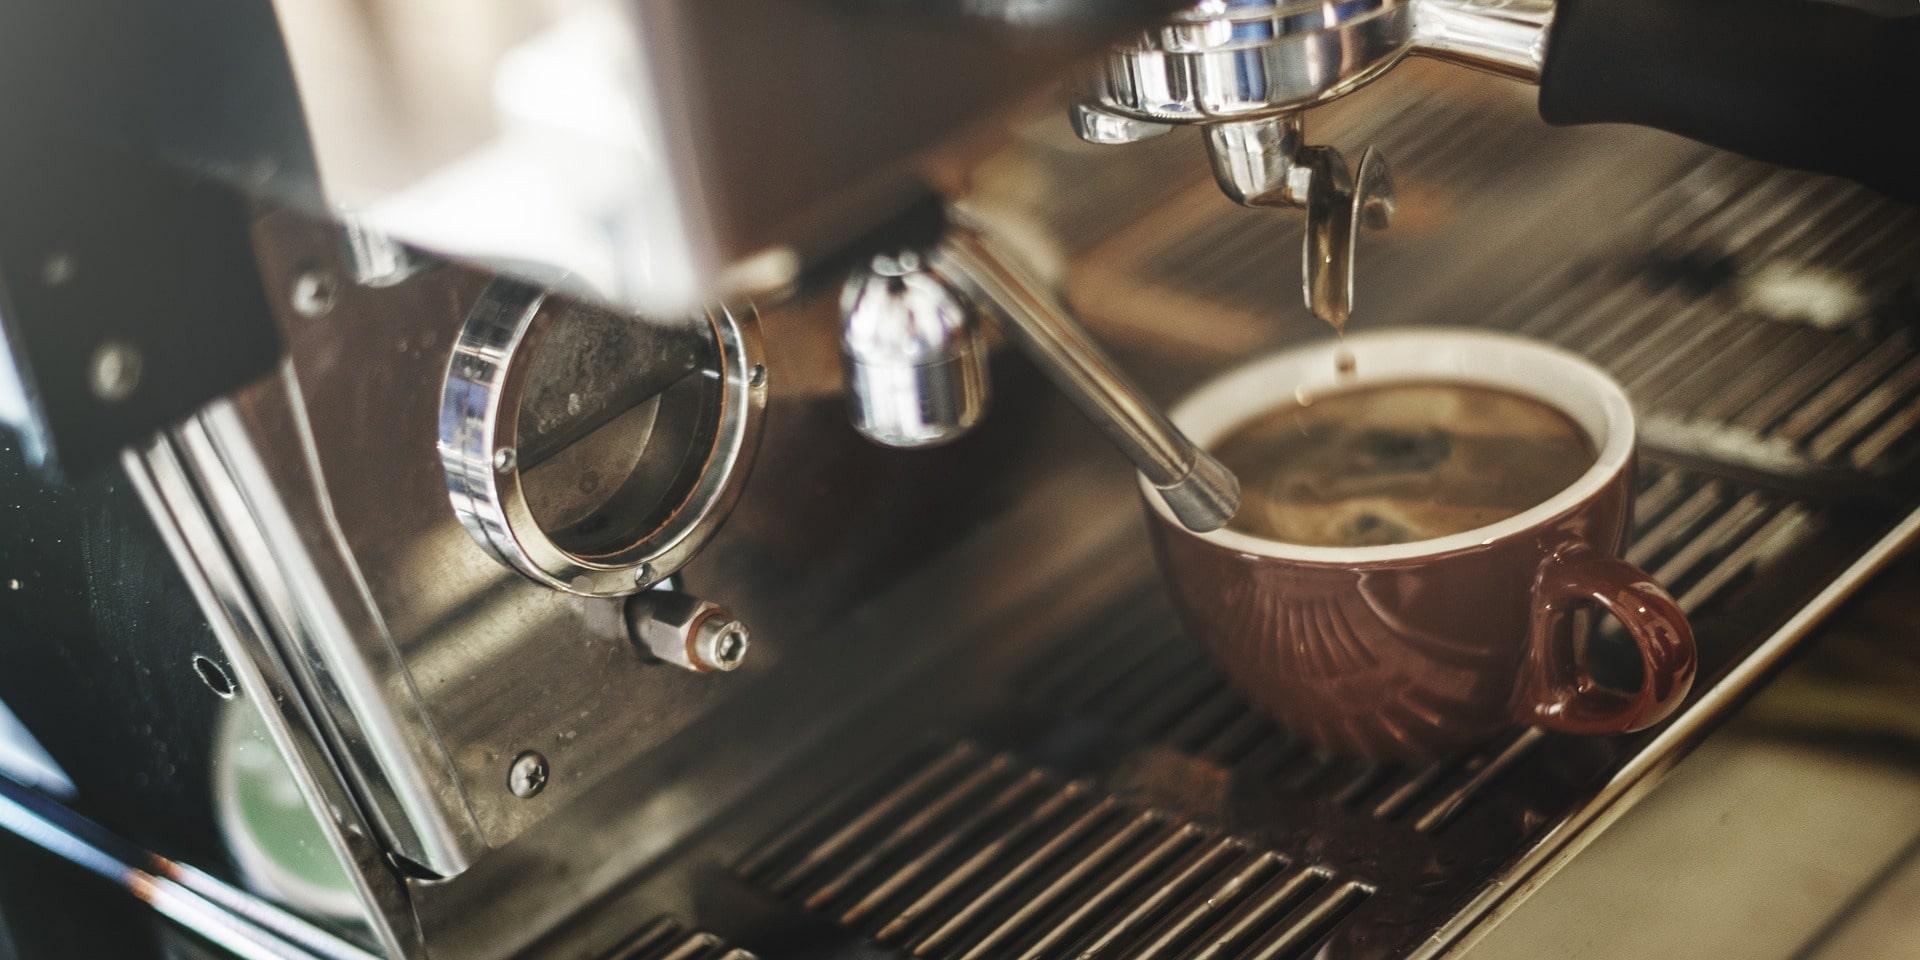 Kaffee aus dem Automaten